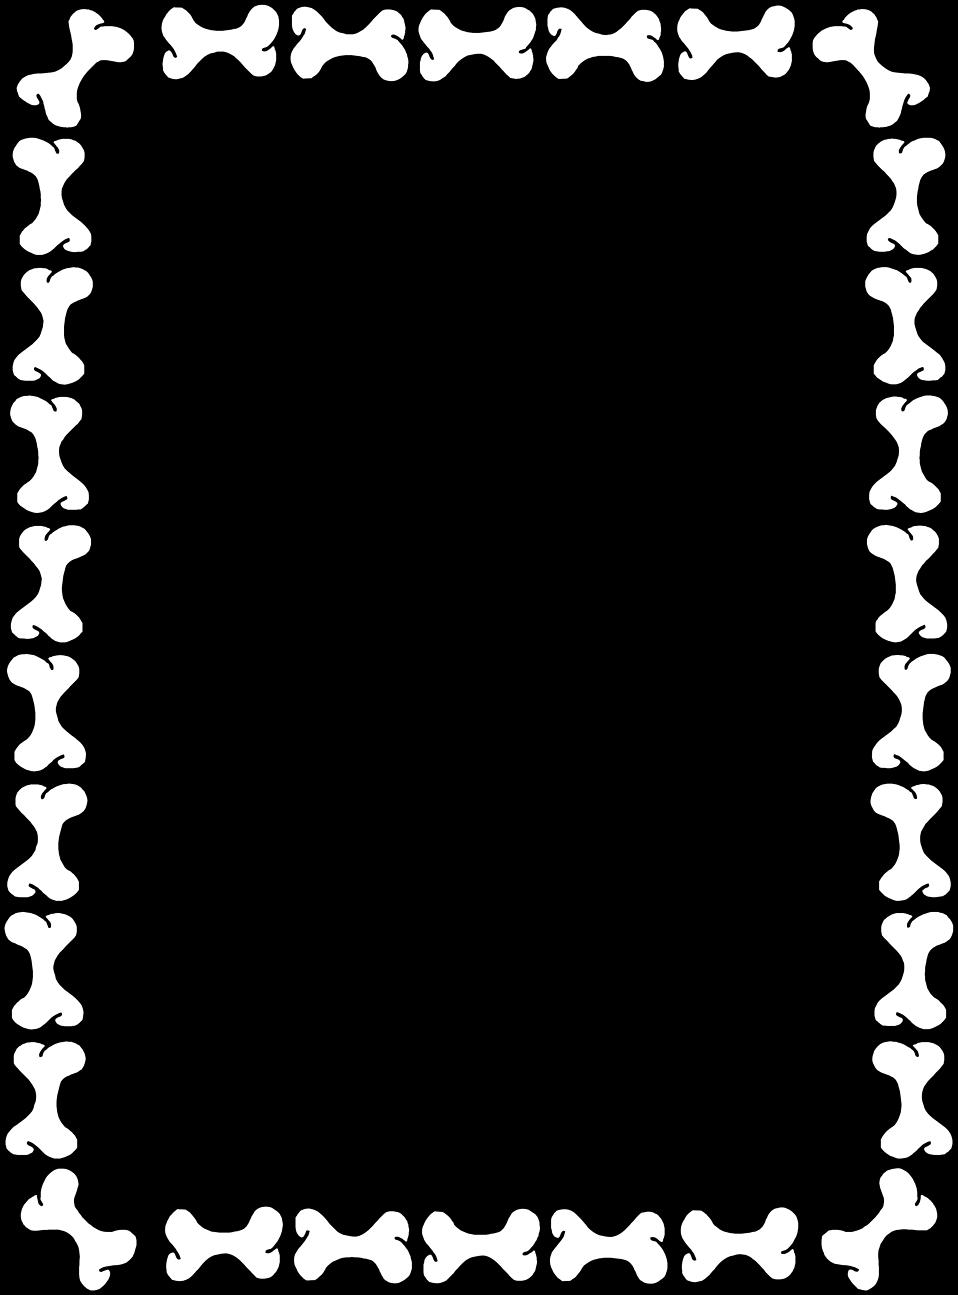 Illustration of a blank border of dog bones : Free Stock Photo